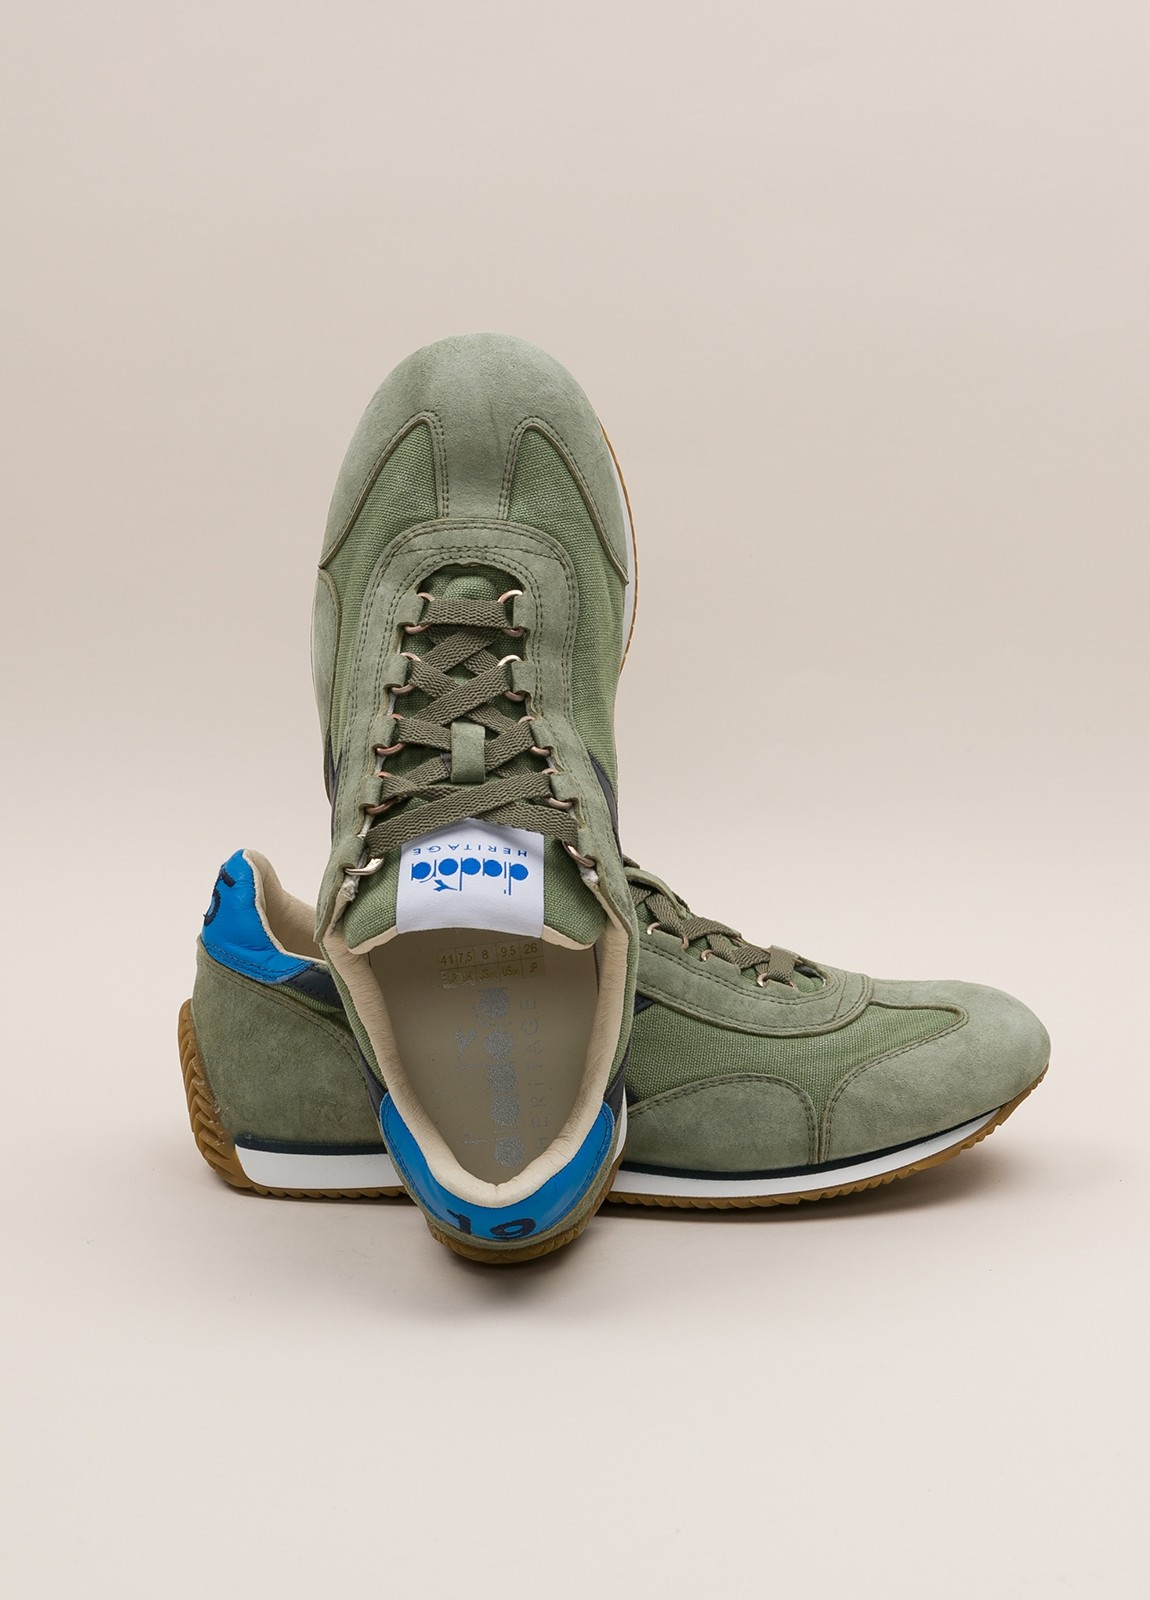 Sneakers DIADORA color verde - Ítem4